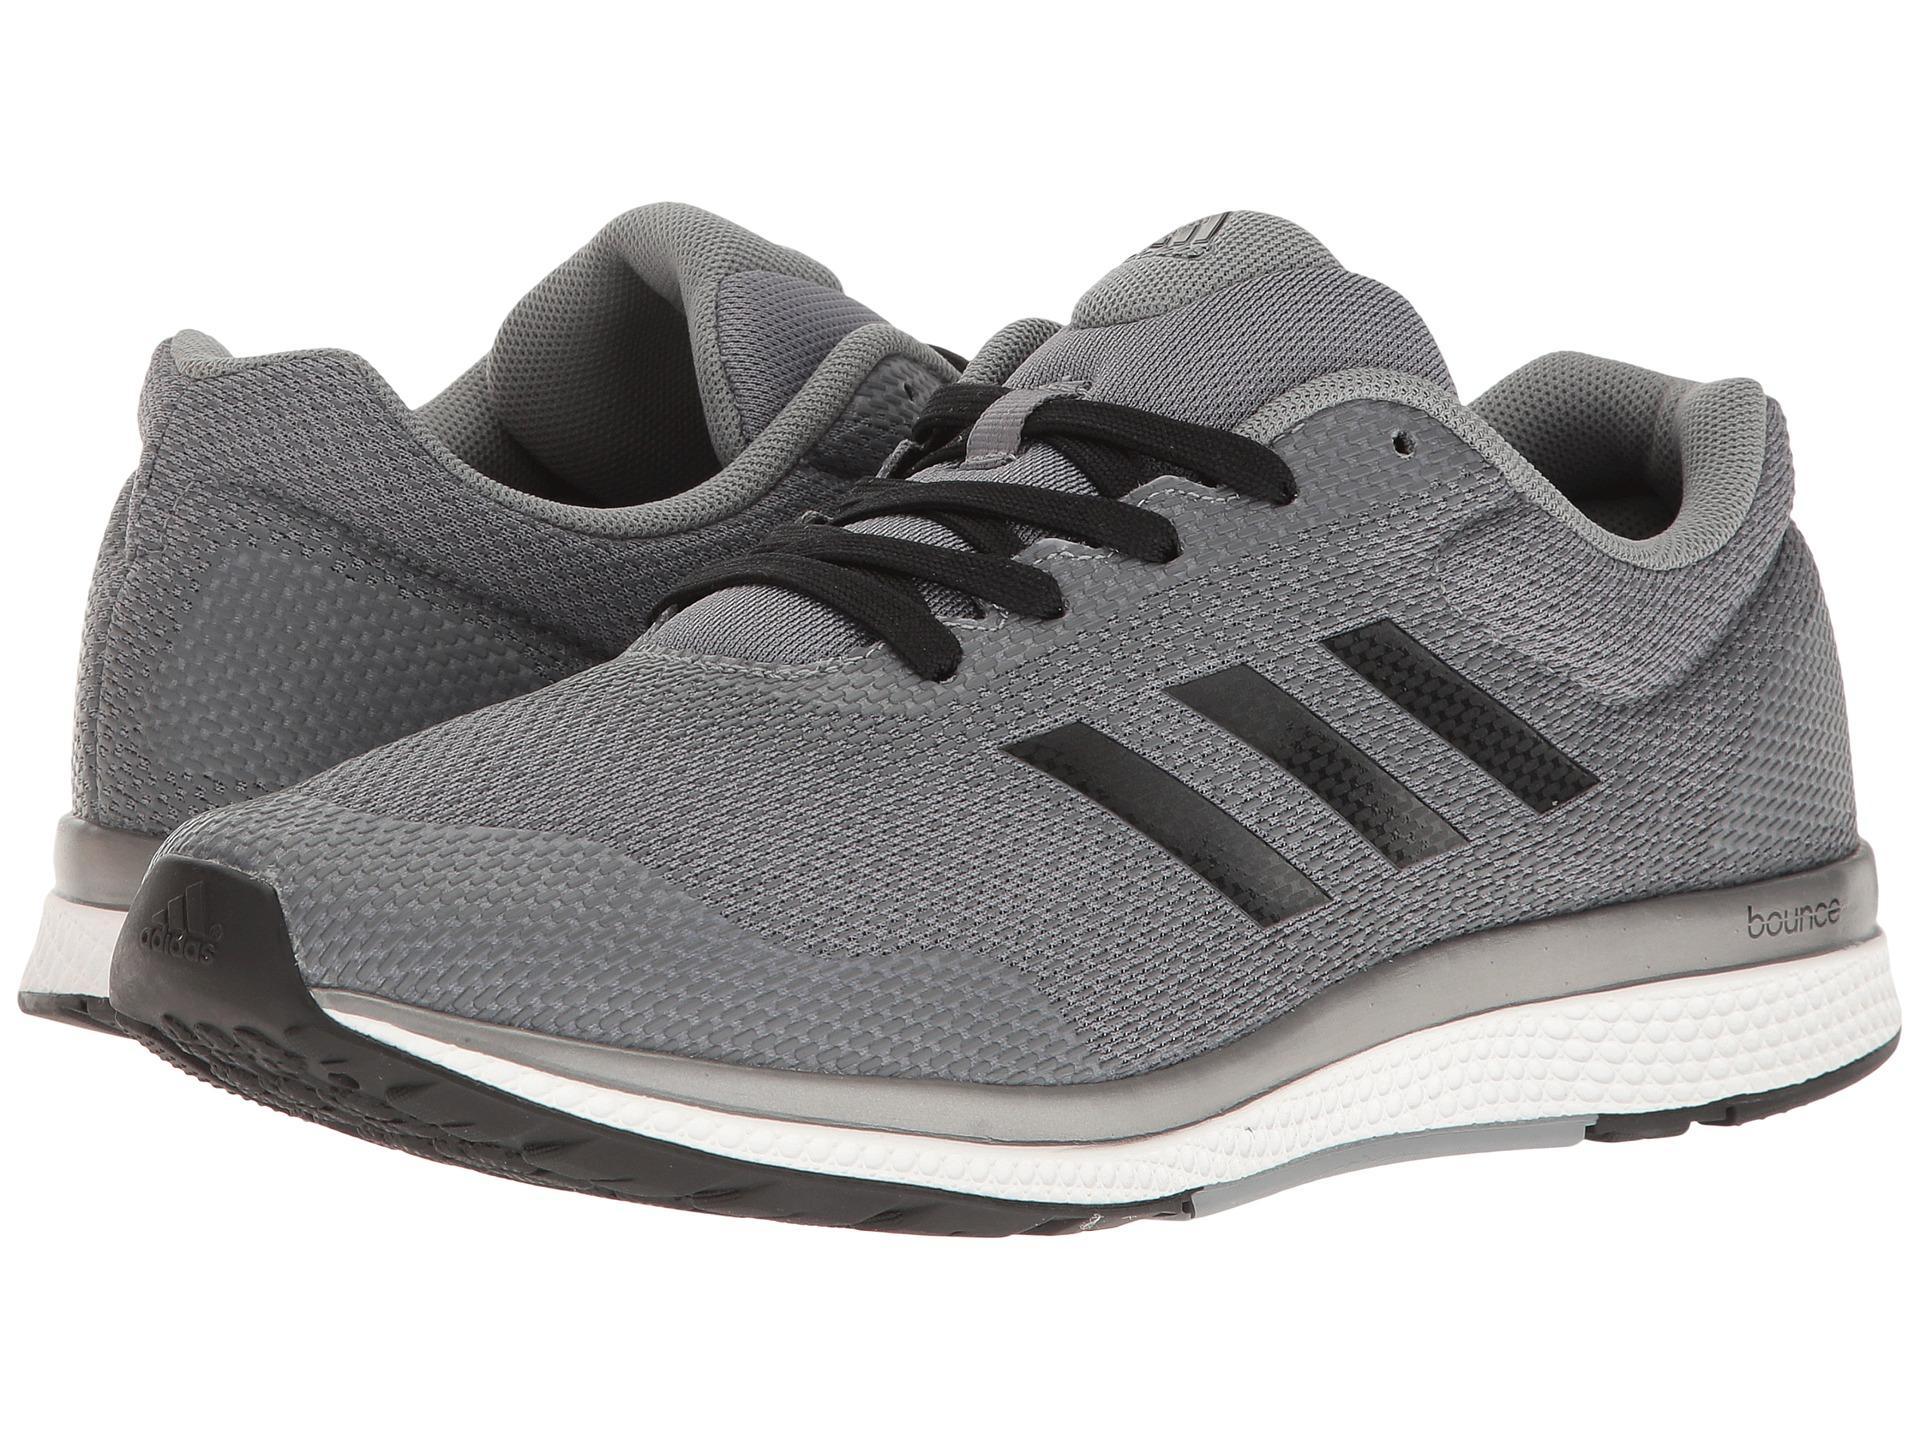 db62a9eb3 Lyst - adidas Originals Mana Bounce 2 - Aramis in Gray for Men